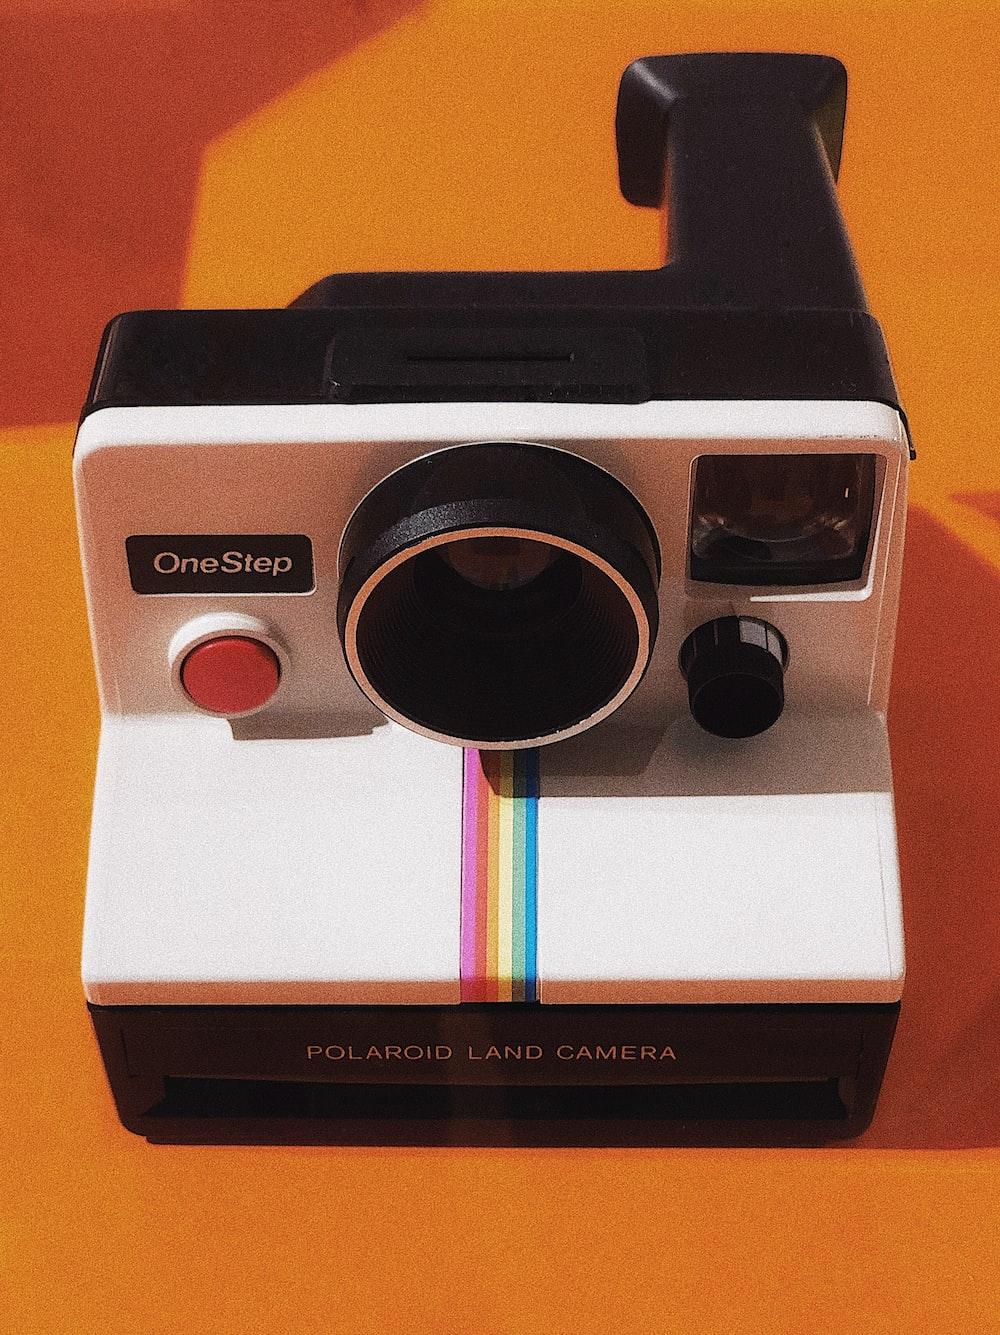 white and black Polaroid OneStep land camera